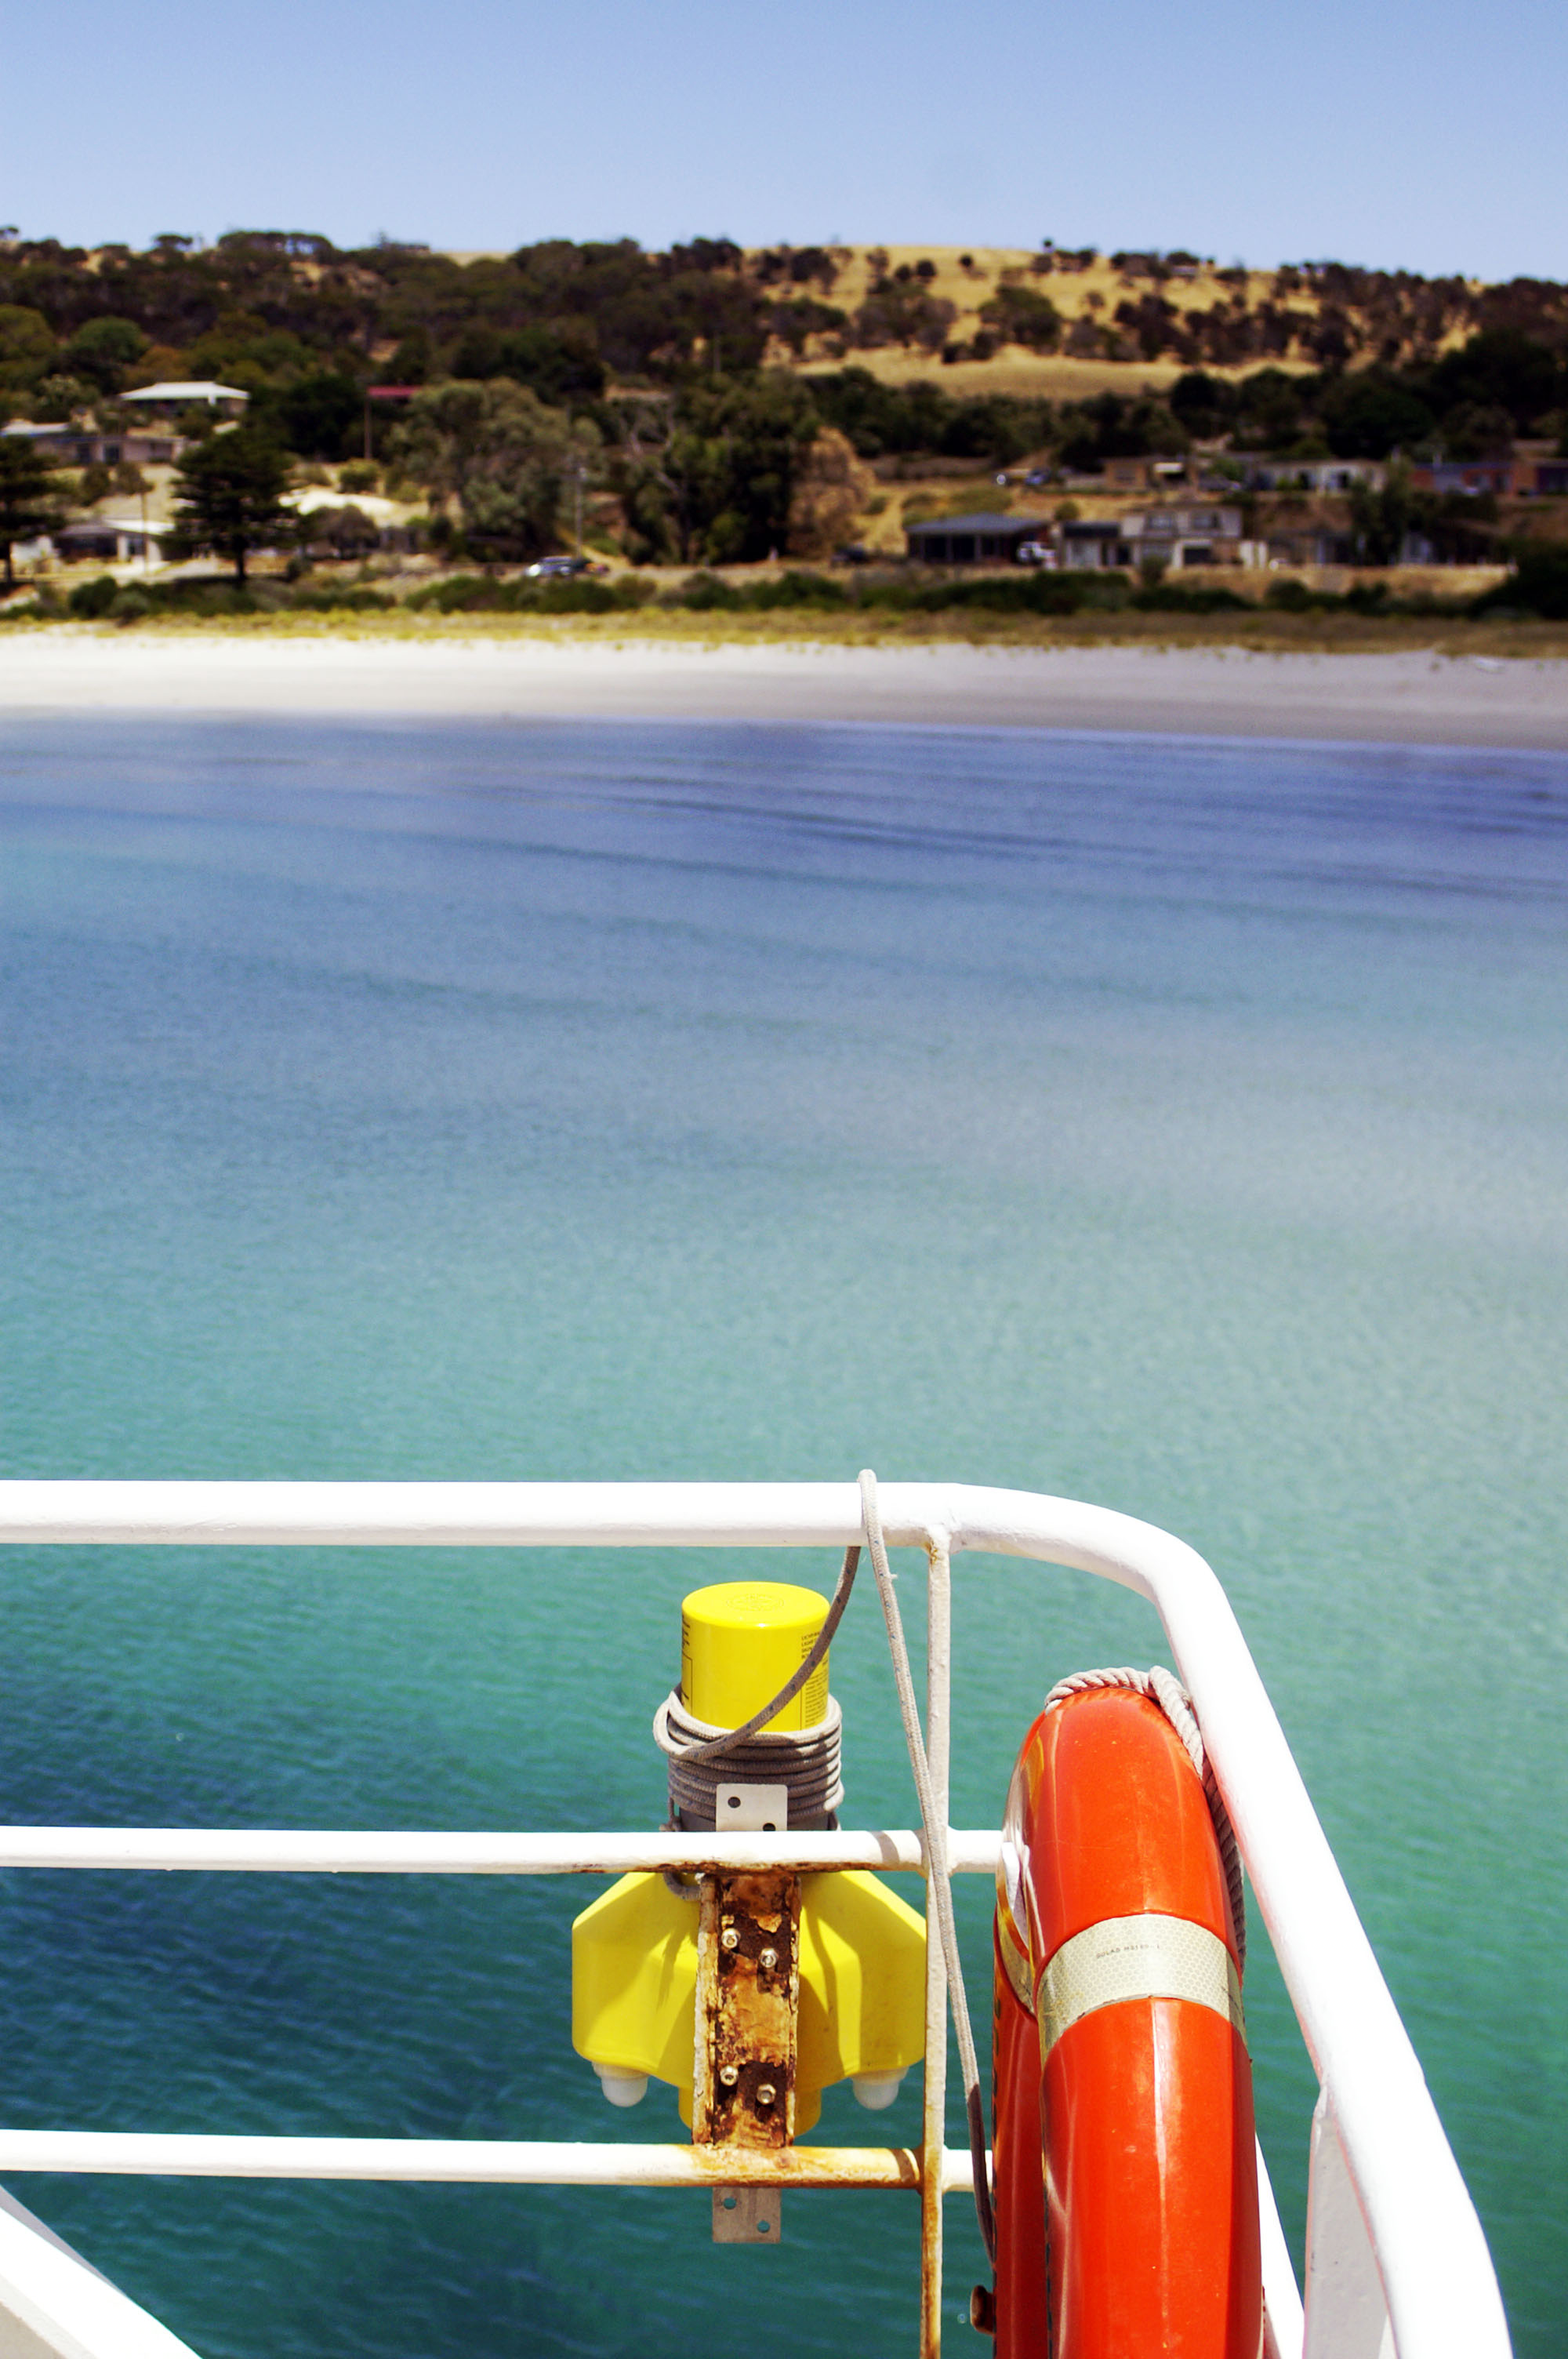 Arrivée à Kangaroo Island